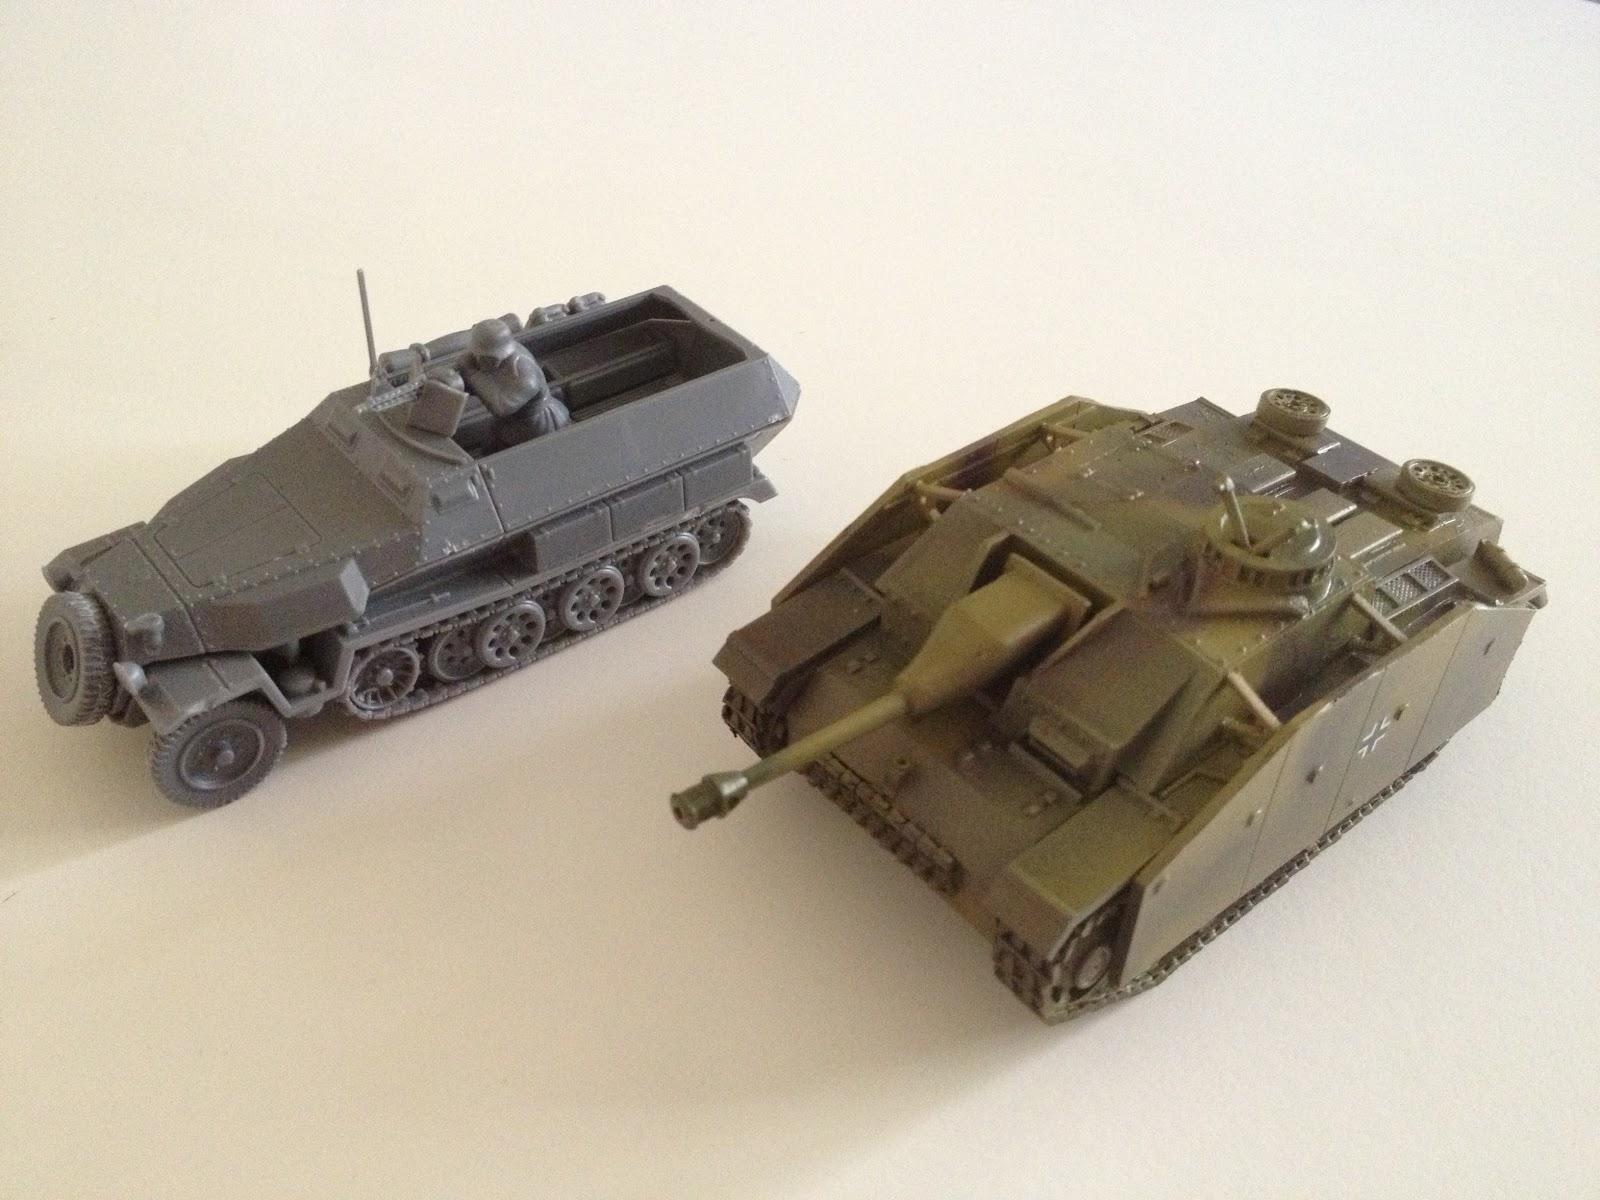 Vue de profil: comparaison Sdkfz 251/1 - Stug III ausf G